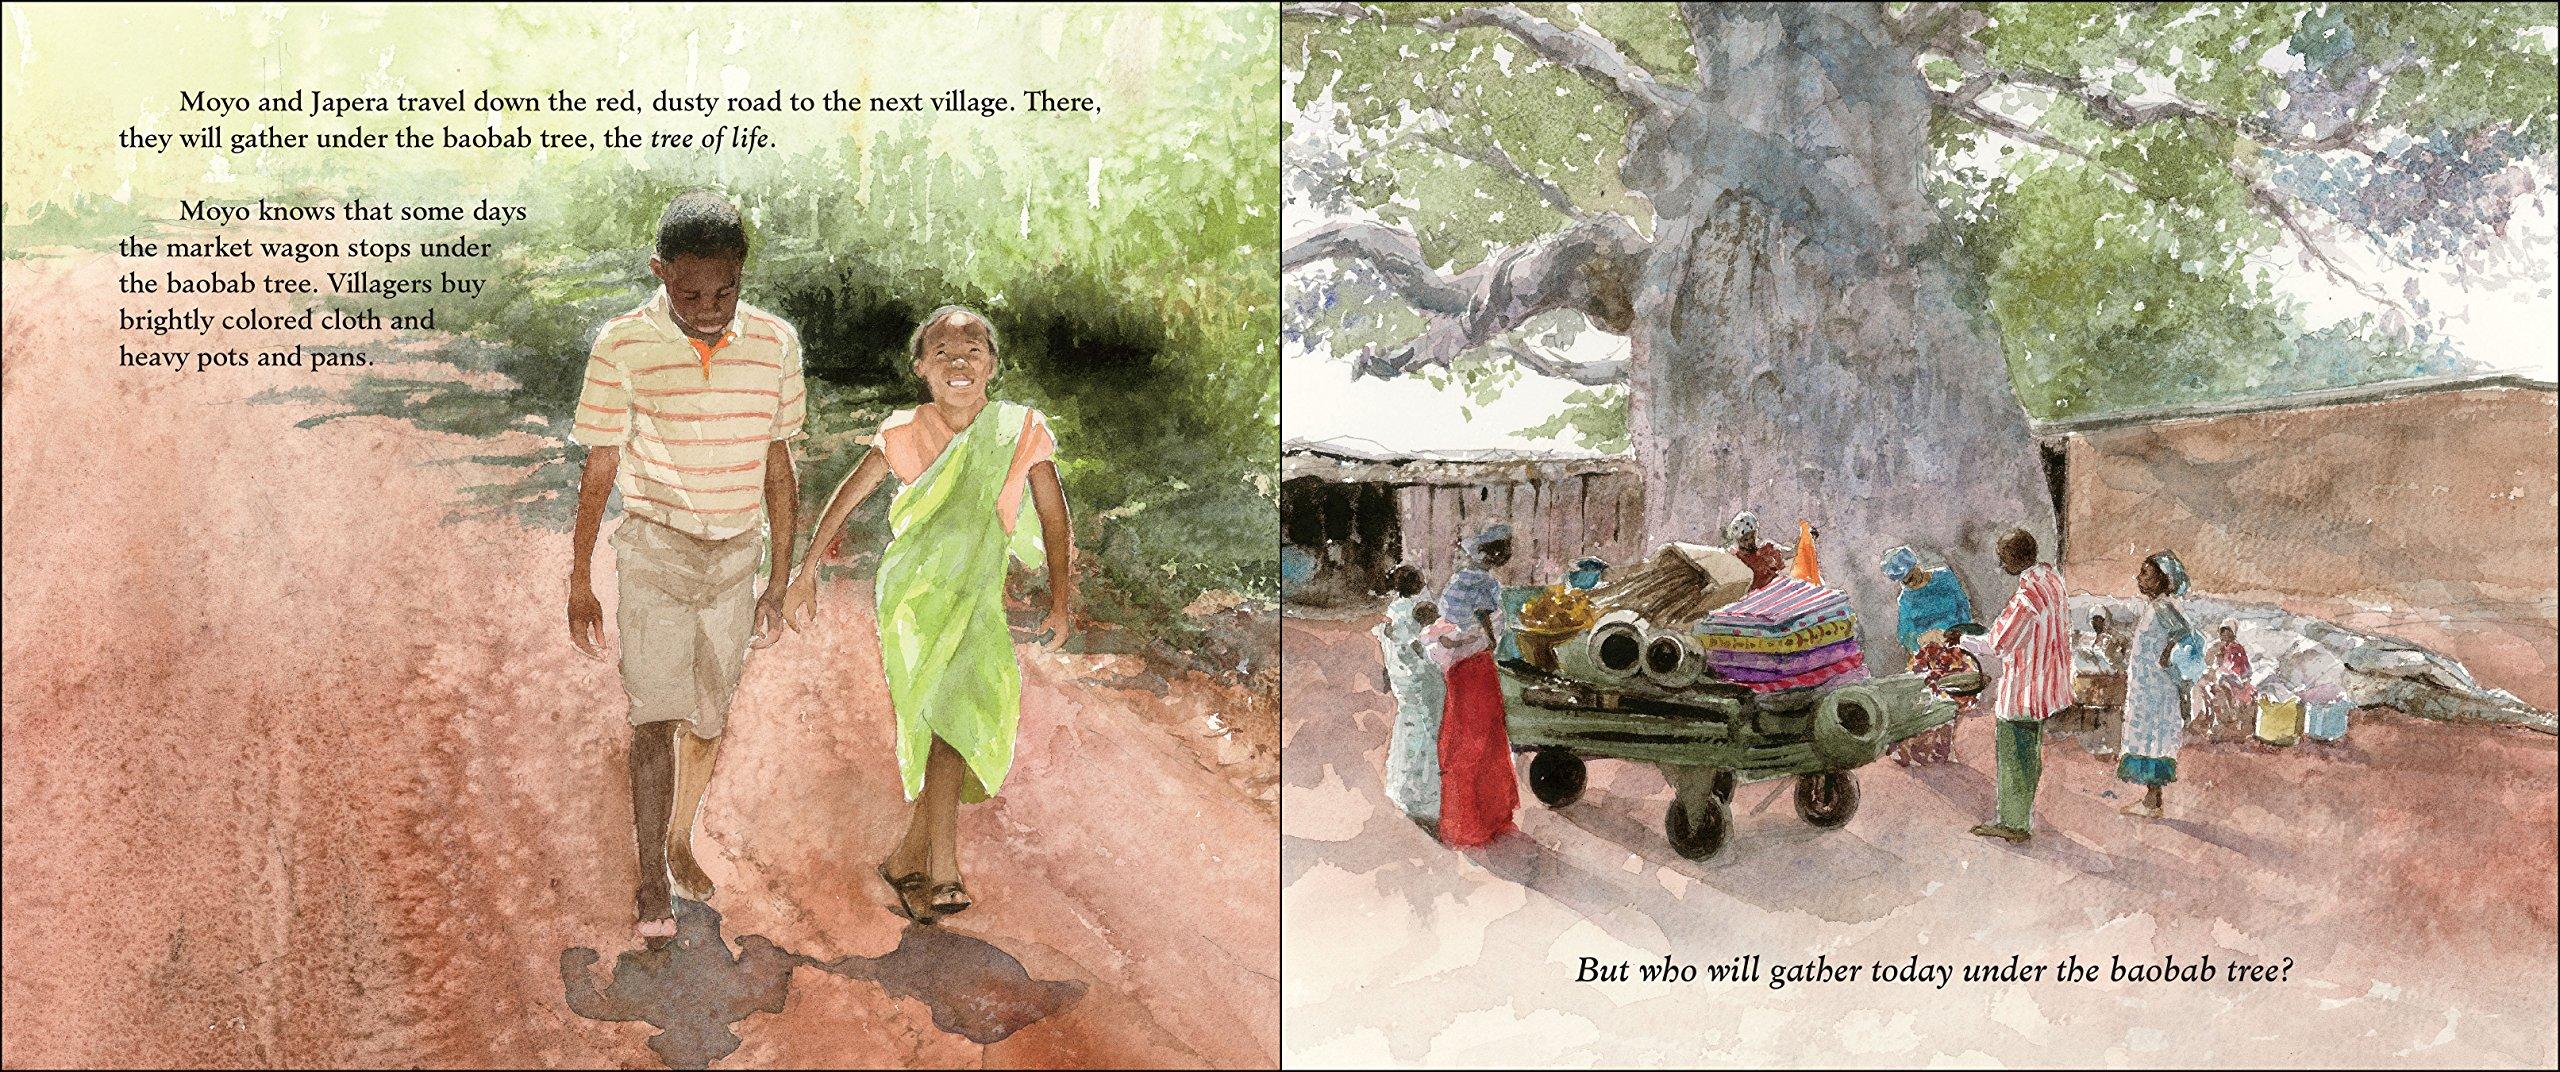 Amazon com: Under the Baobab Tree (0025986725617): Julie